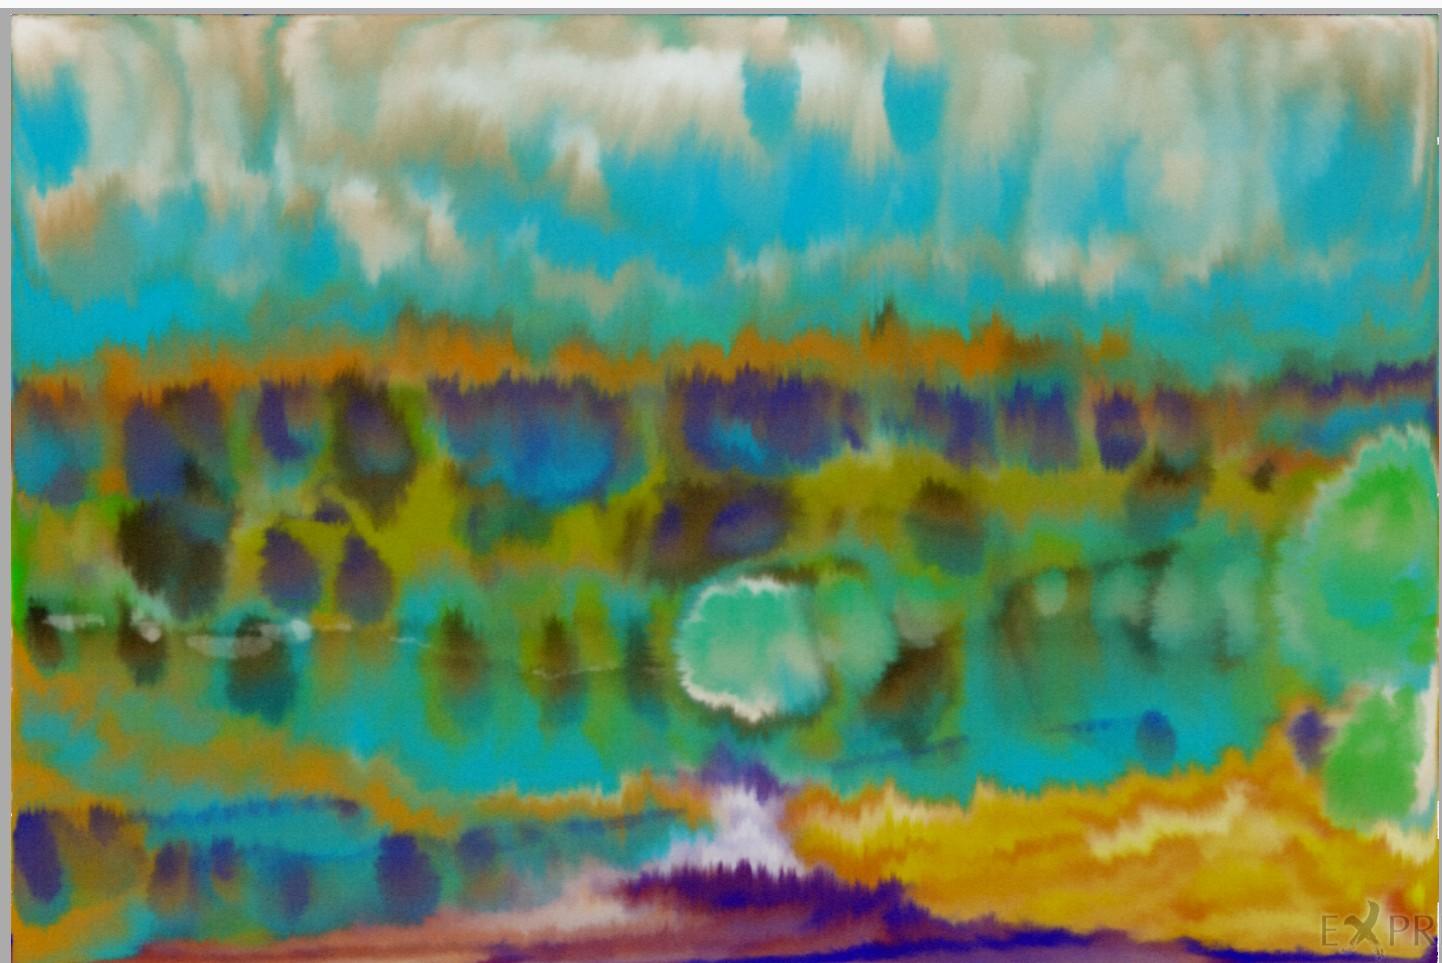 [ AUTRES LOGICIELS ] Expresii : l'aquarelle digitale 8Gfd6O6G_o